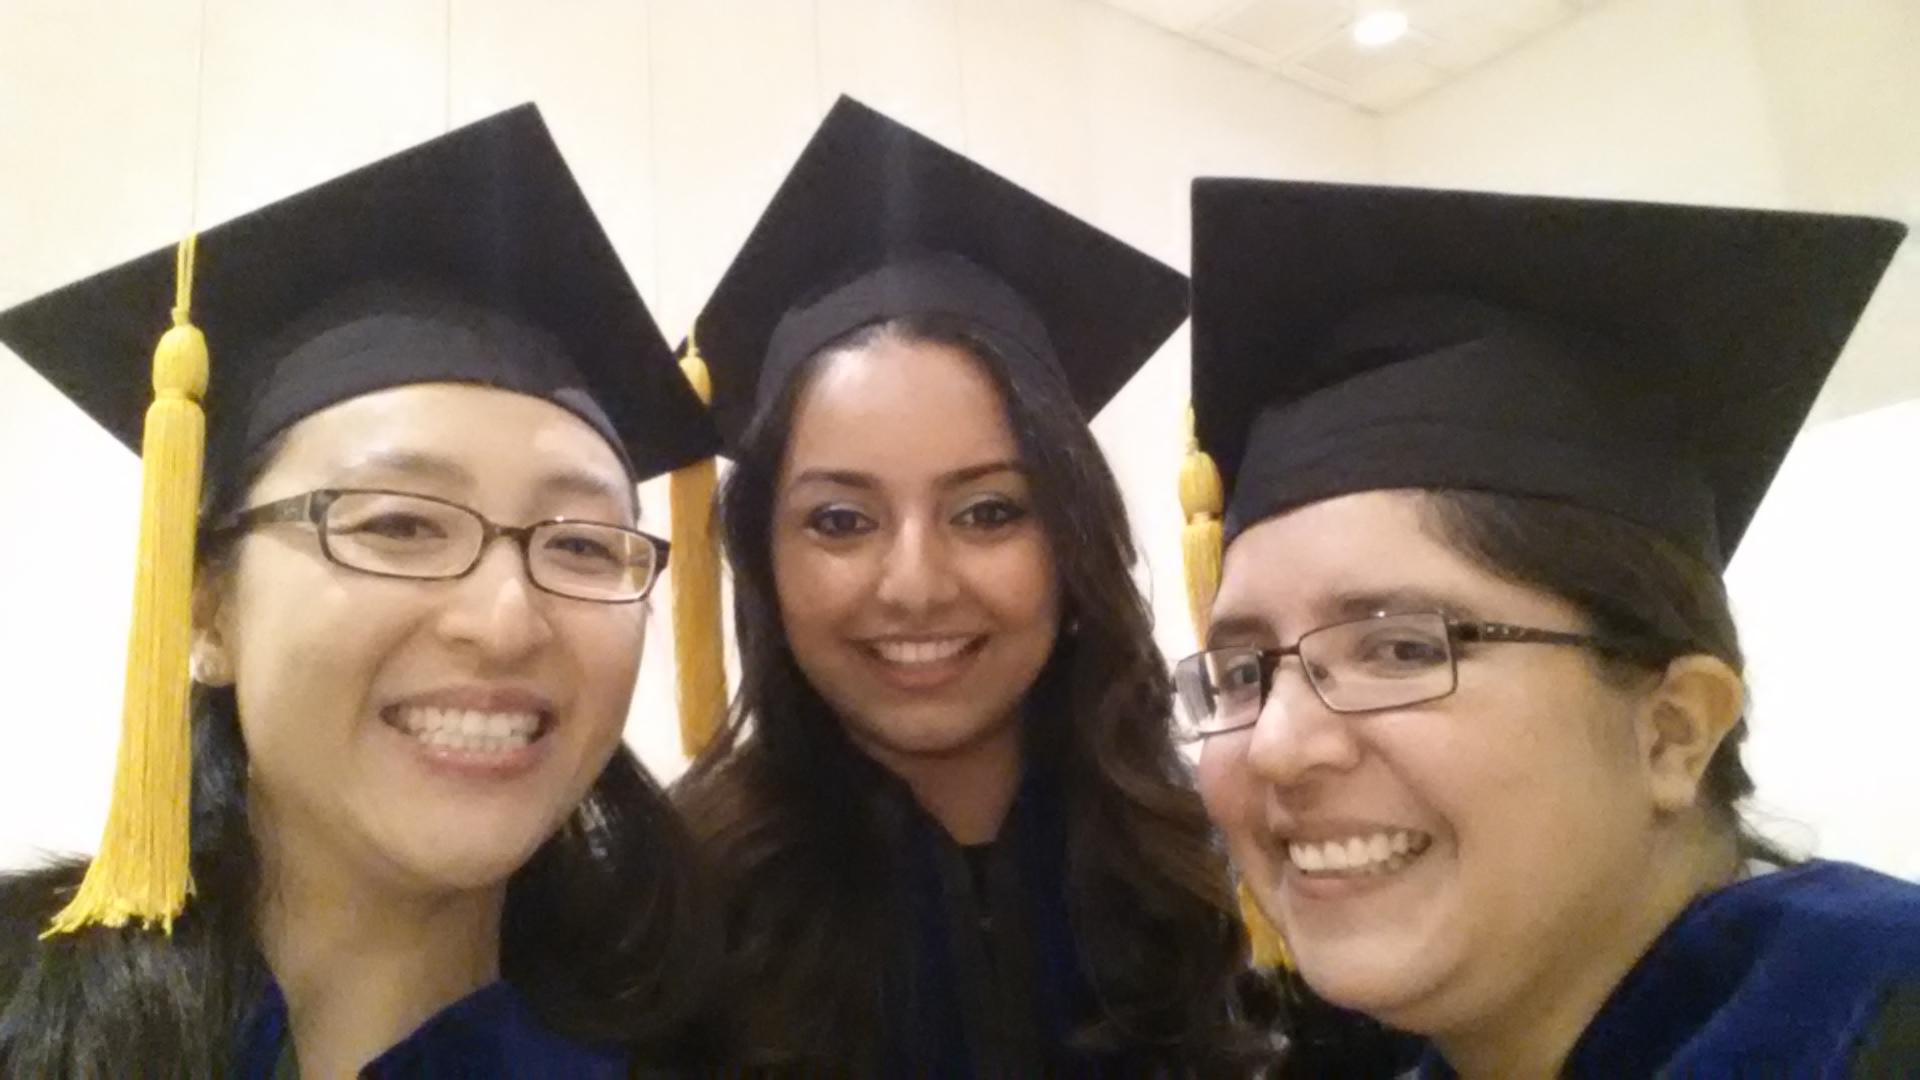 Tiffany, Amritha, and Rocio celebrating at the 2016 graduation program.